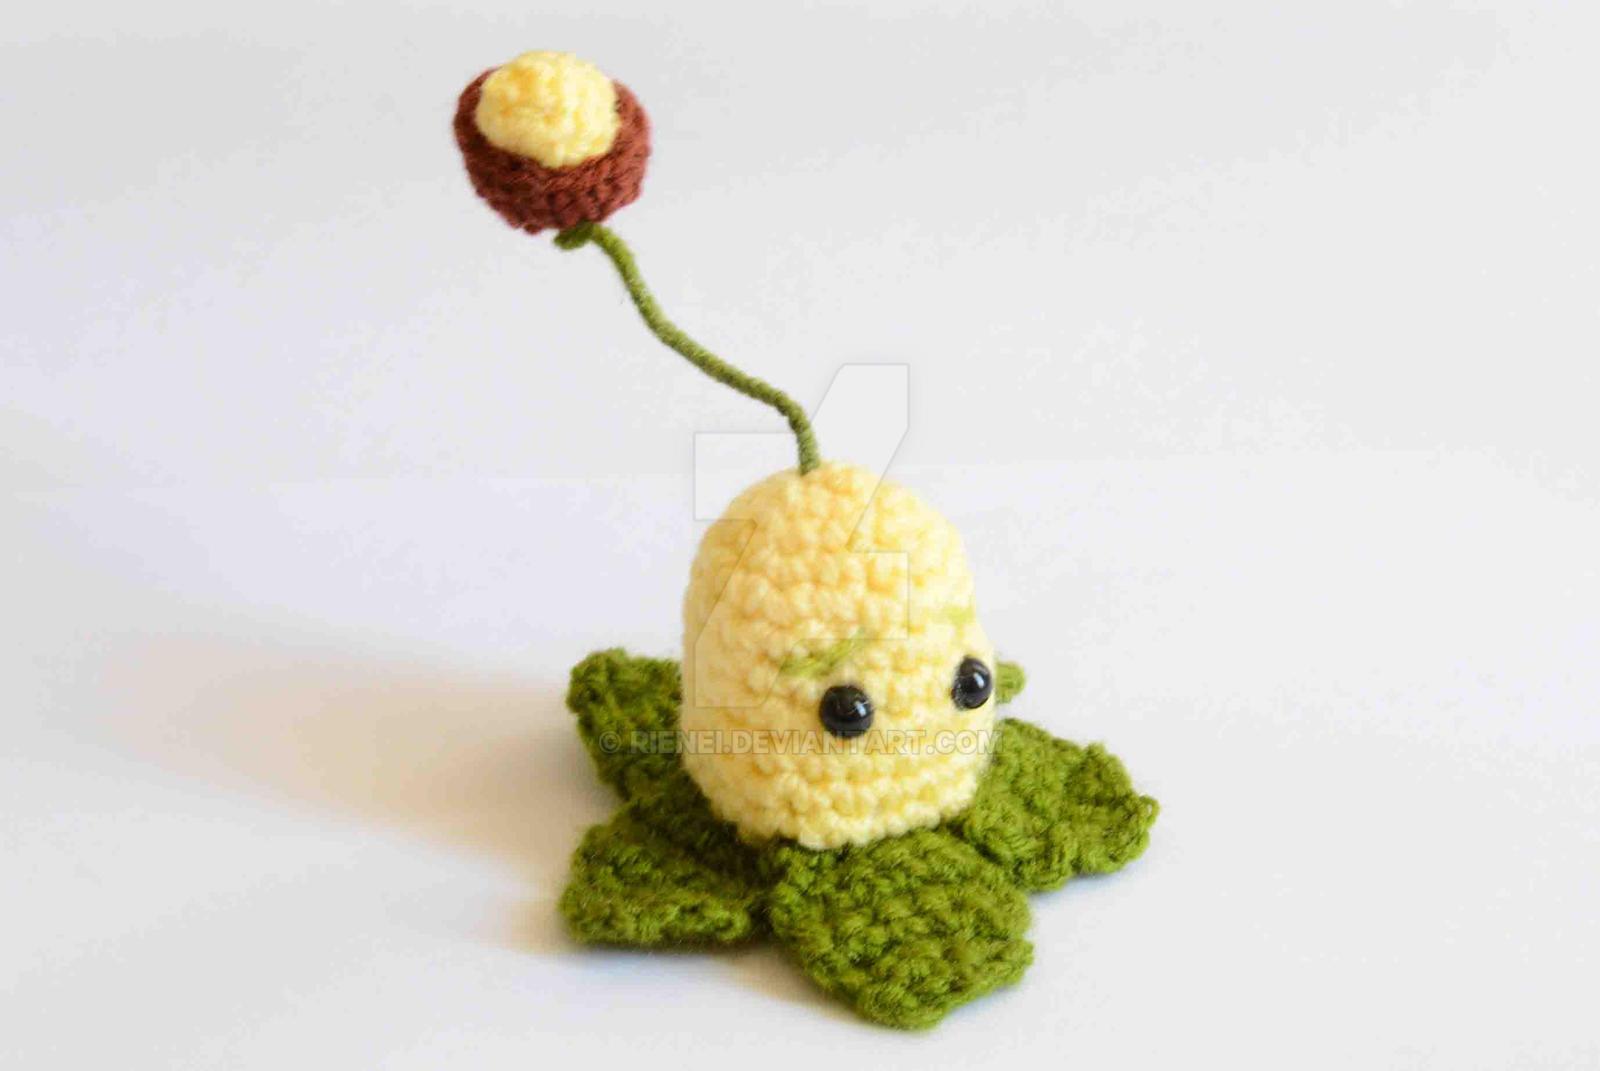 Crochet Plants Vs Zombies Patterns : Crochet Plants VS Zombies Kernel-pult Pattern by Rienei on DeviantArt